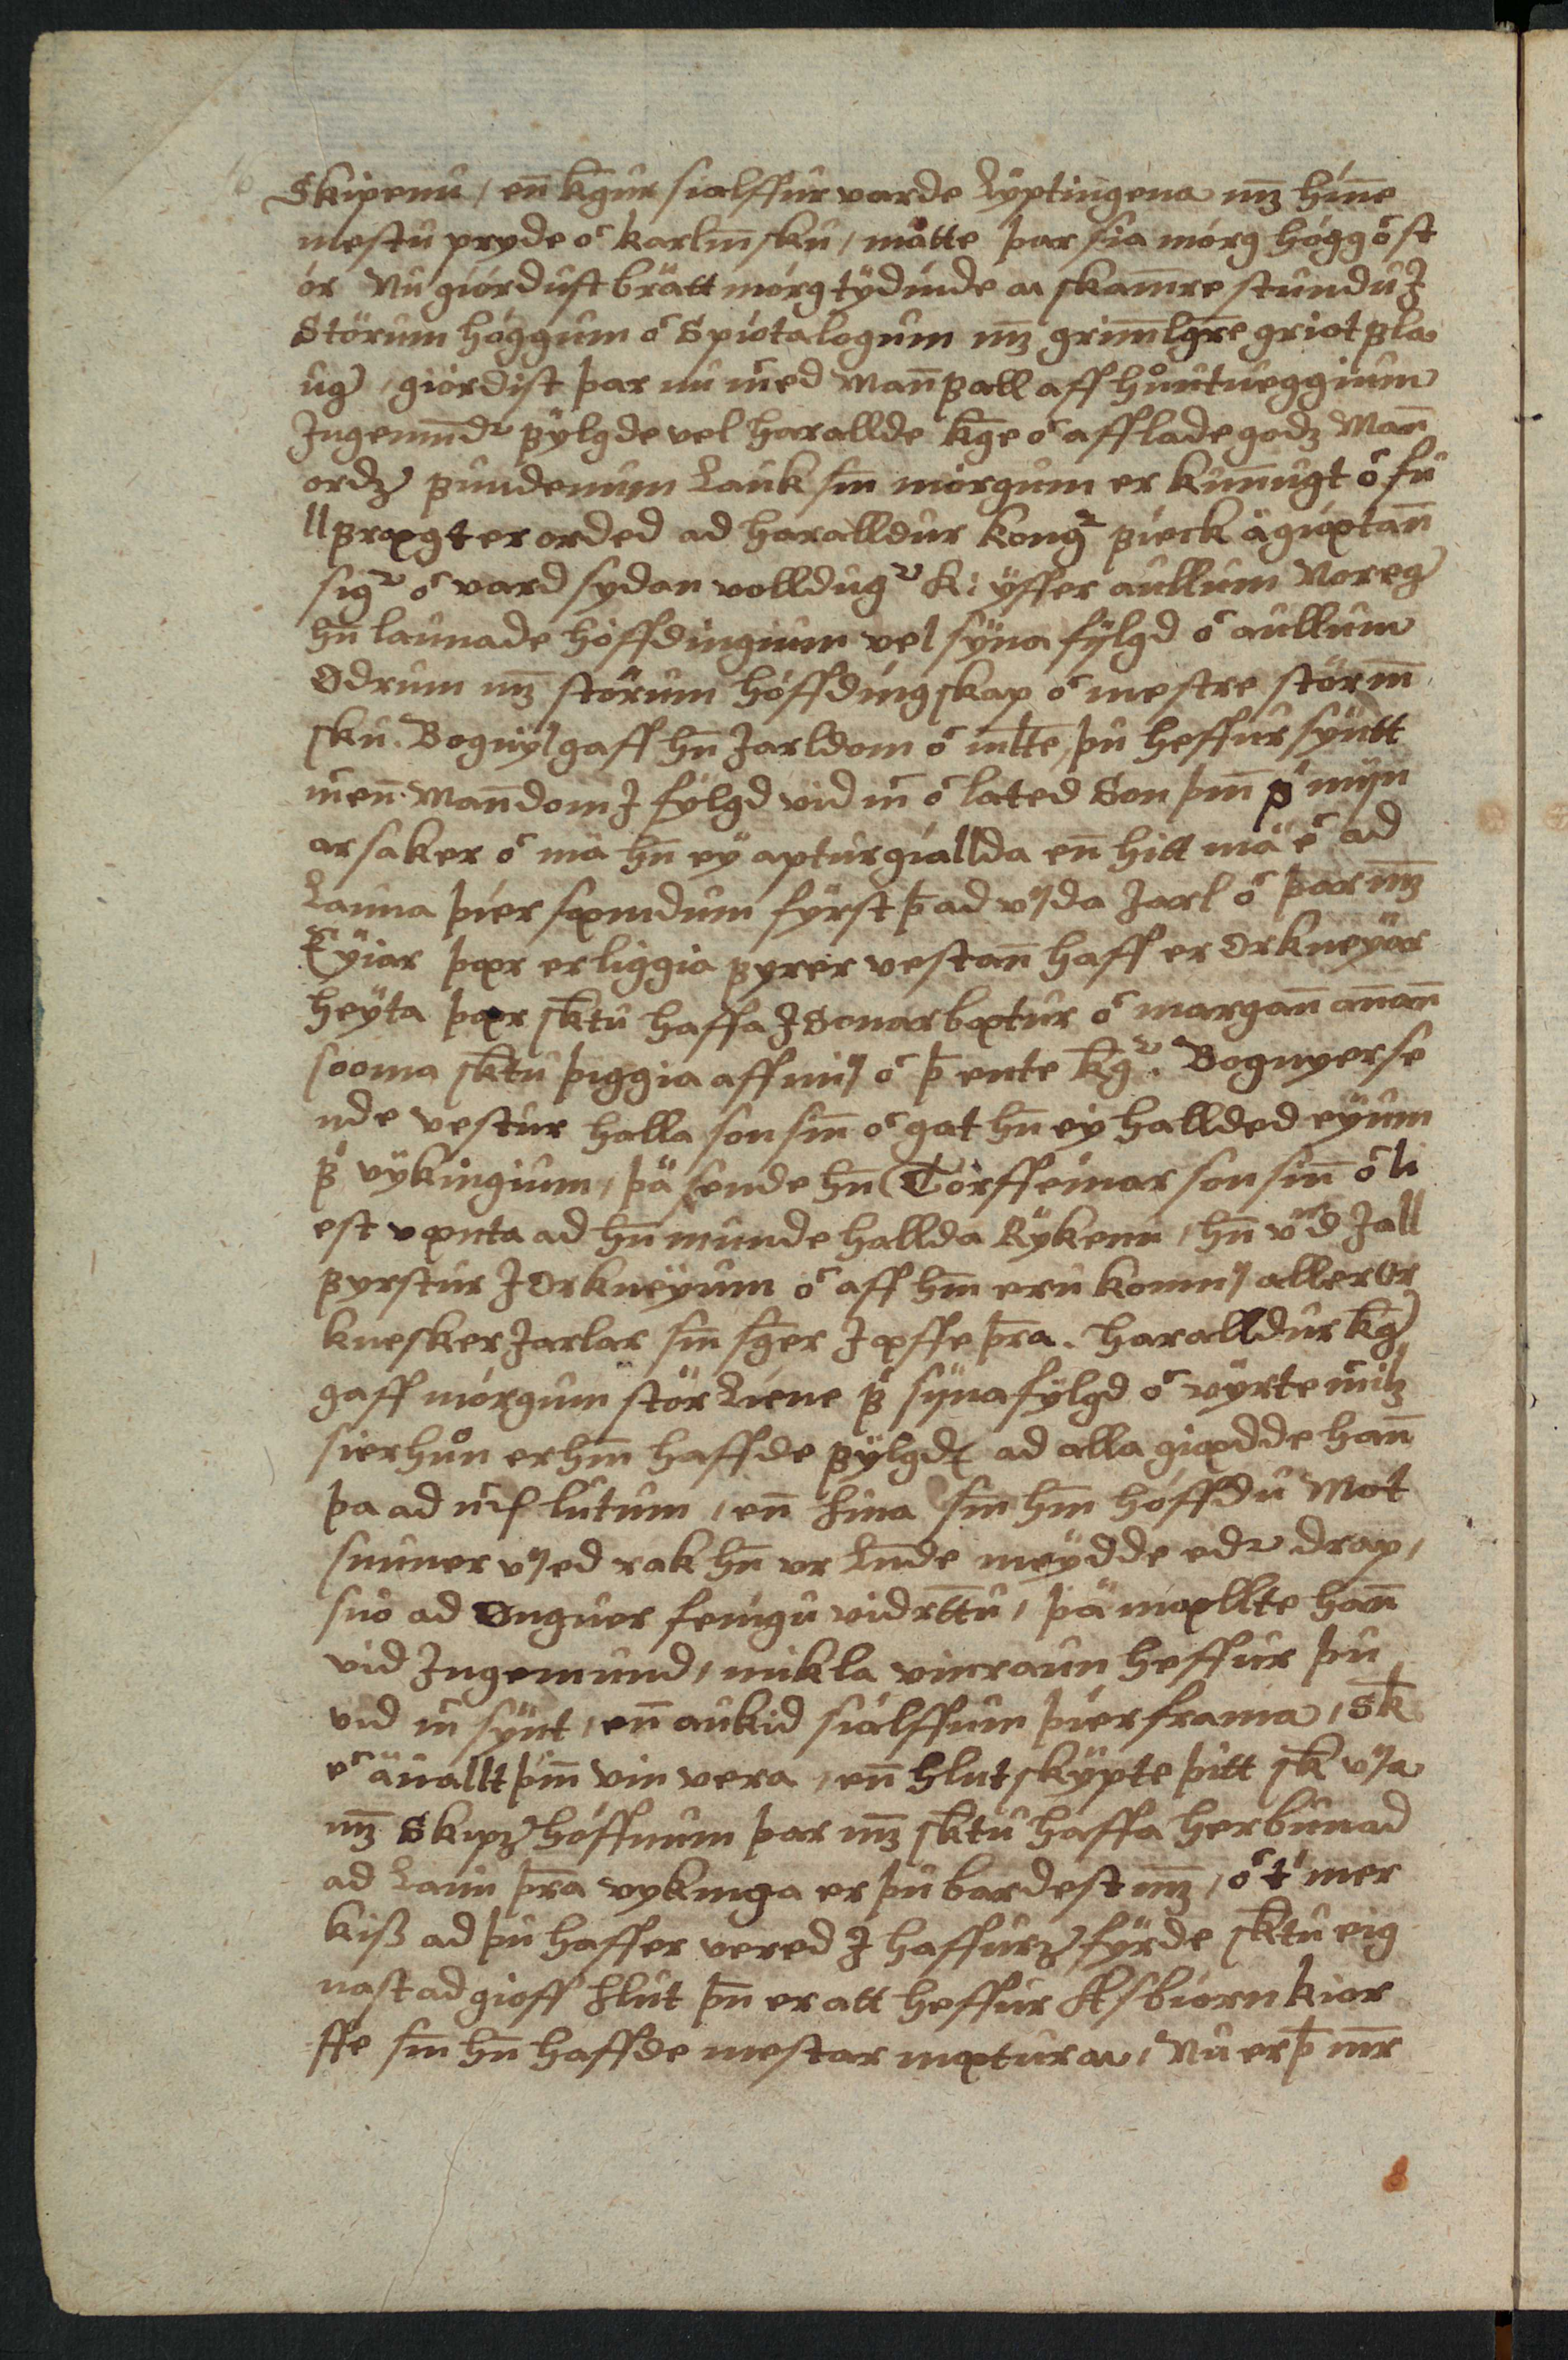 AM 138 fol - 8v